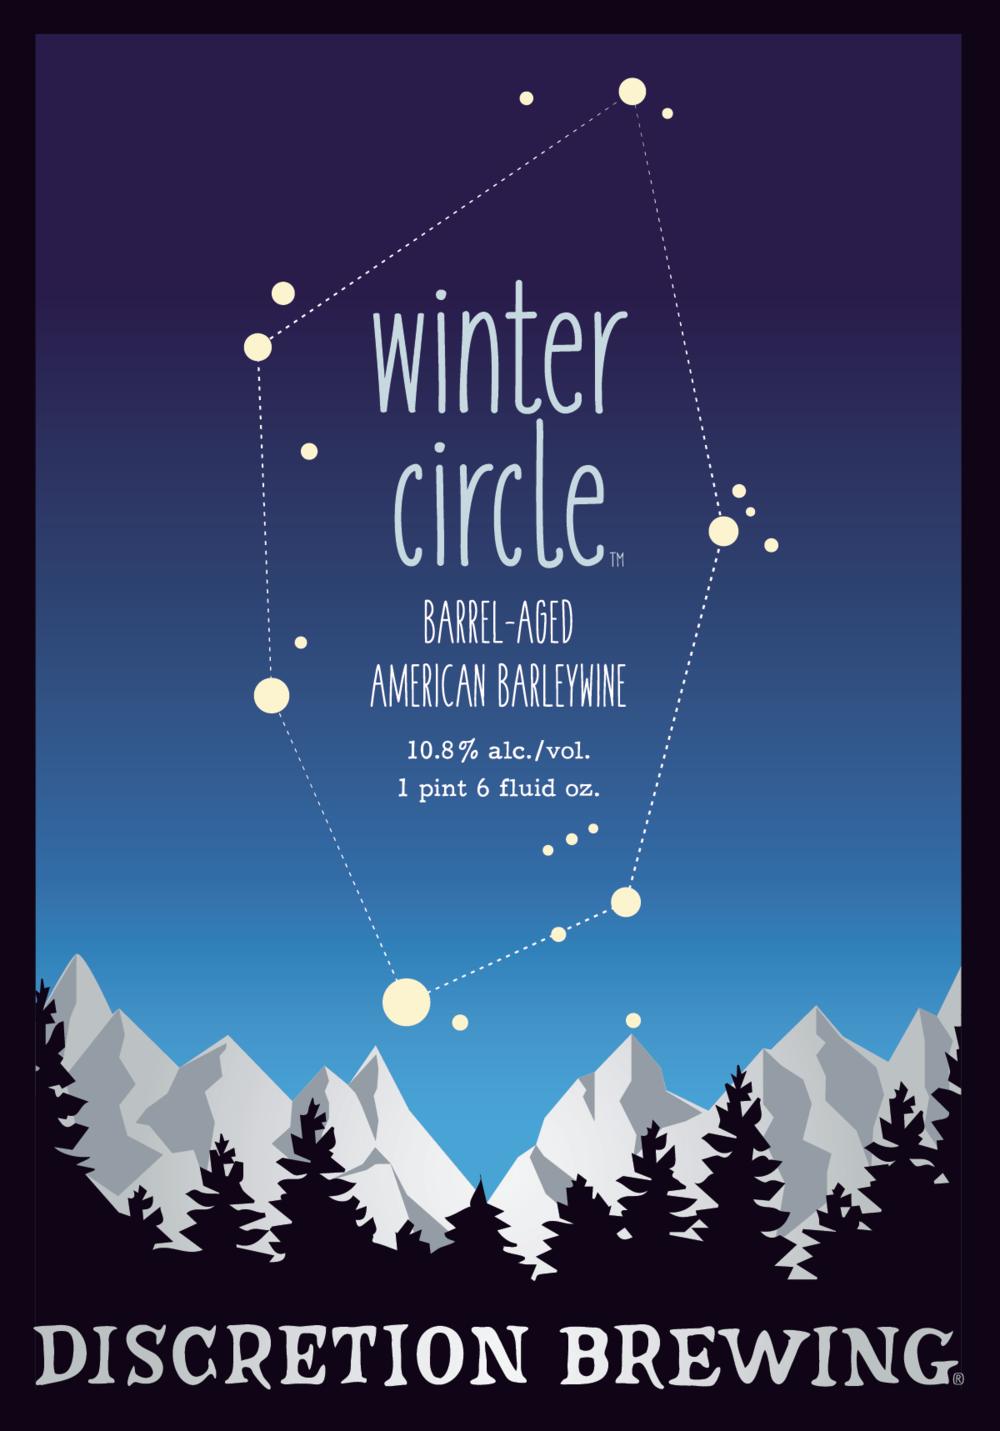 Winter Circle Barrel-Aged Barleywine